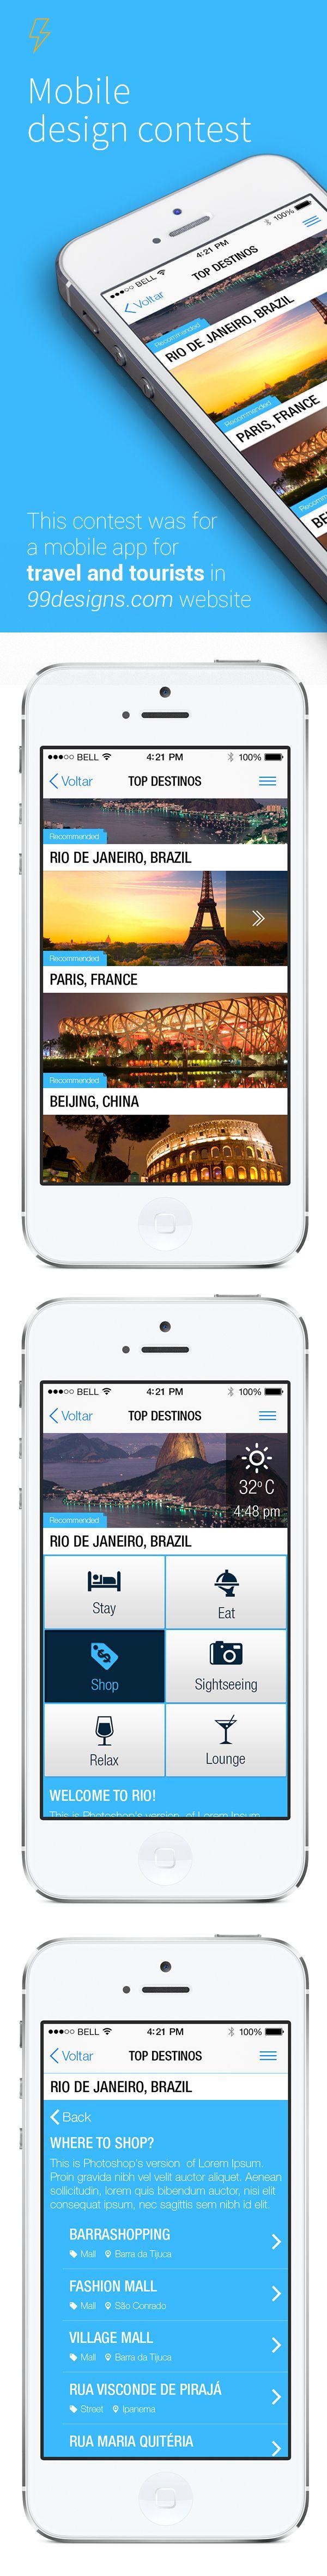 Travel app proposal by Daniel de Paola, via Behance